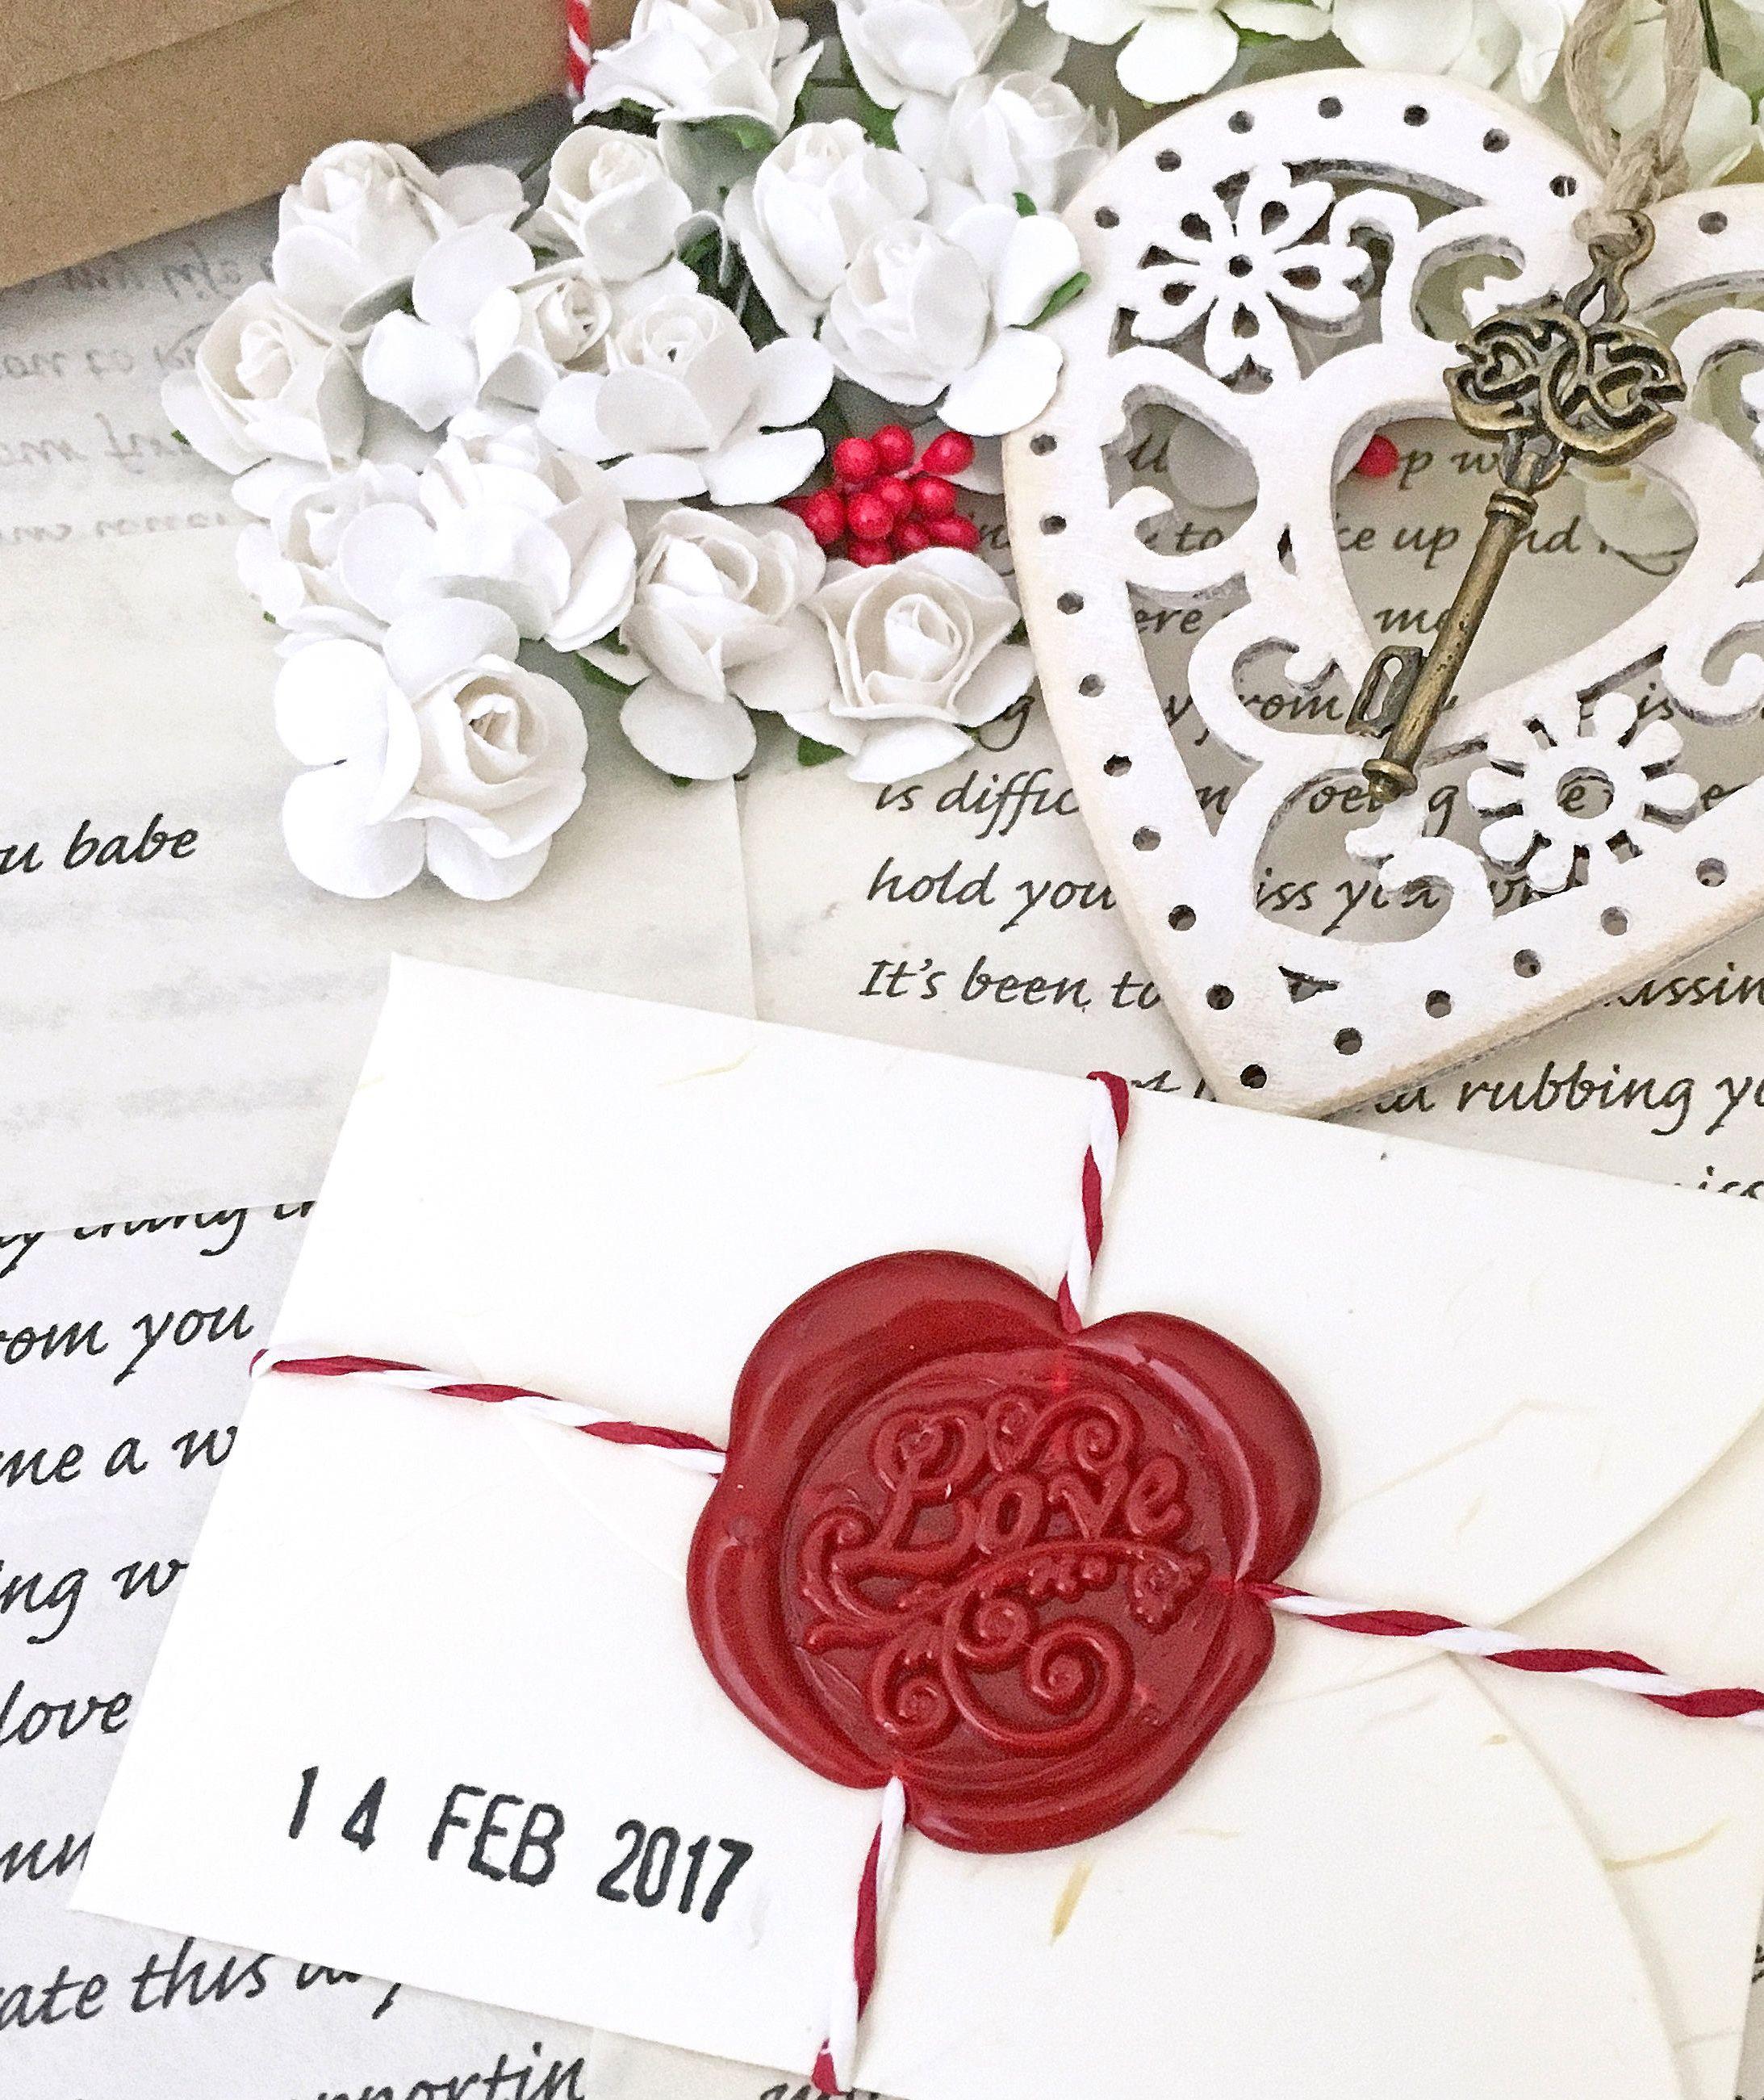 Romantic valentines day gift for girlfriend unique love